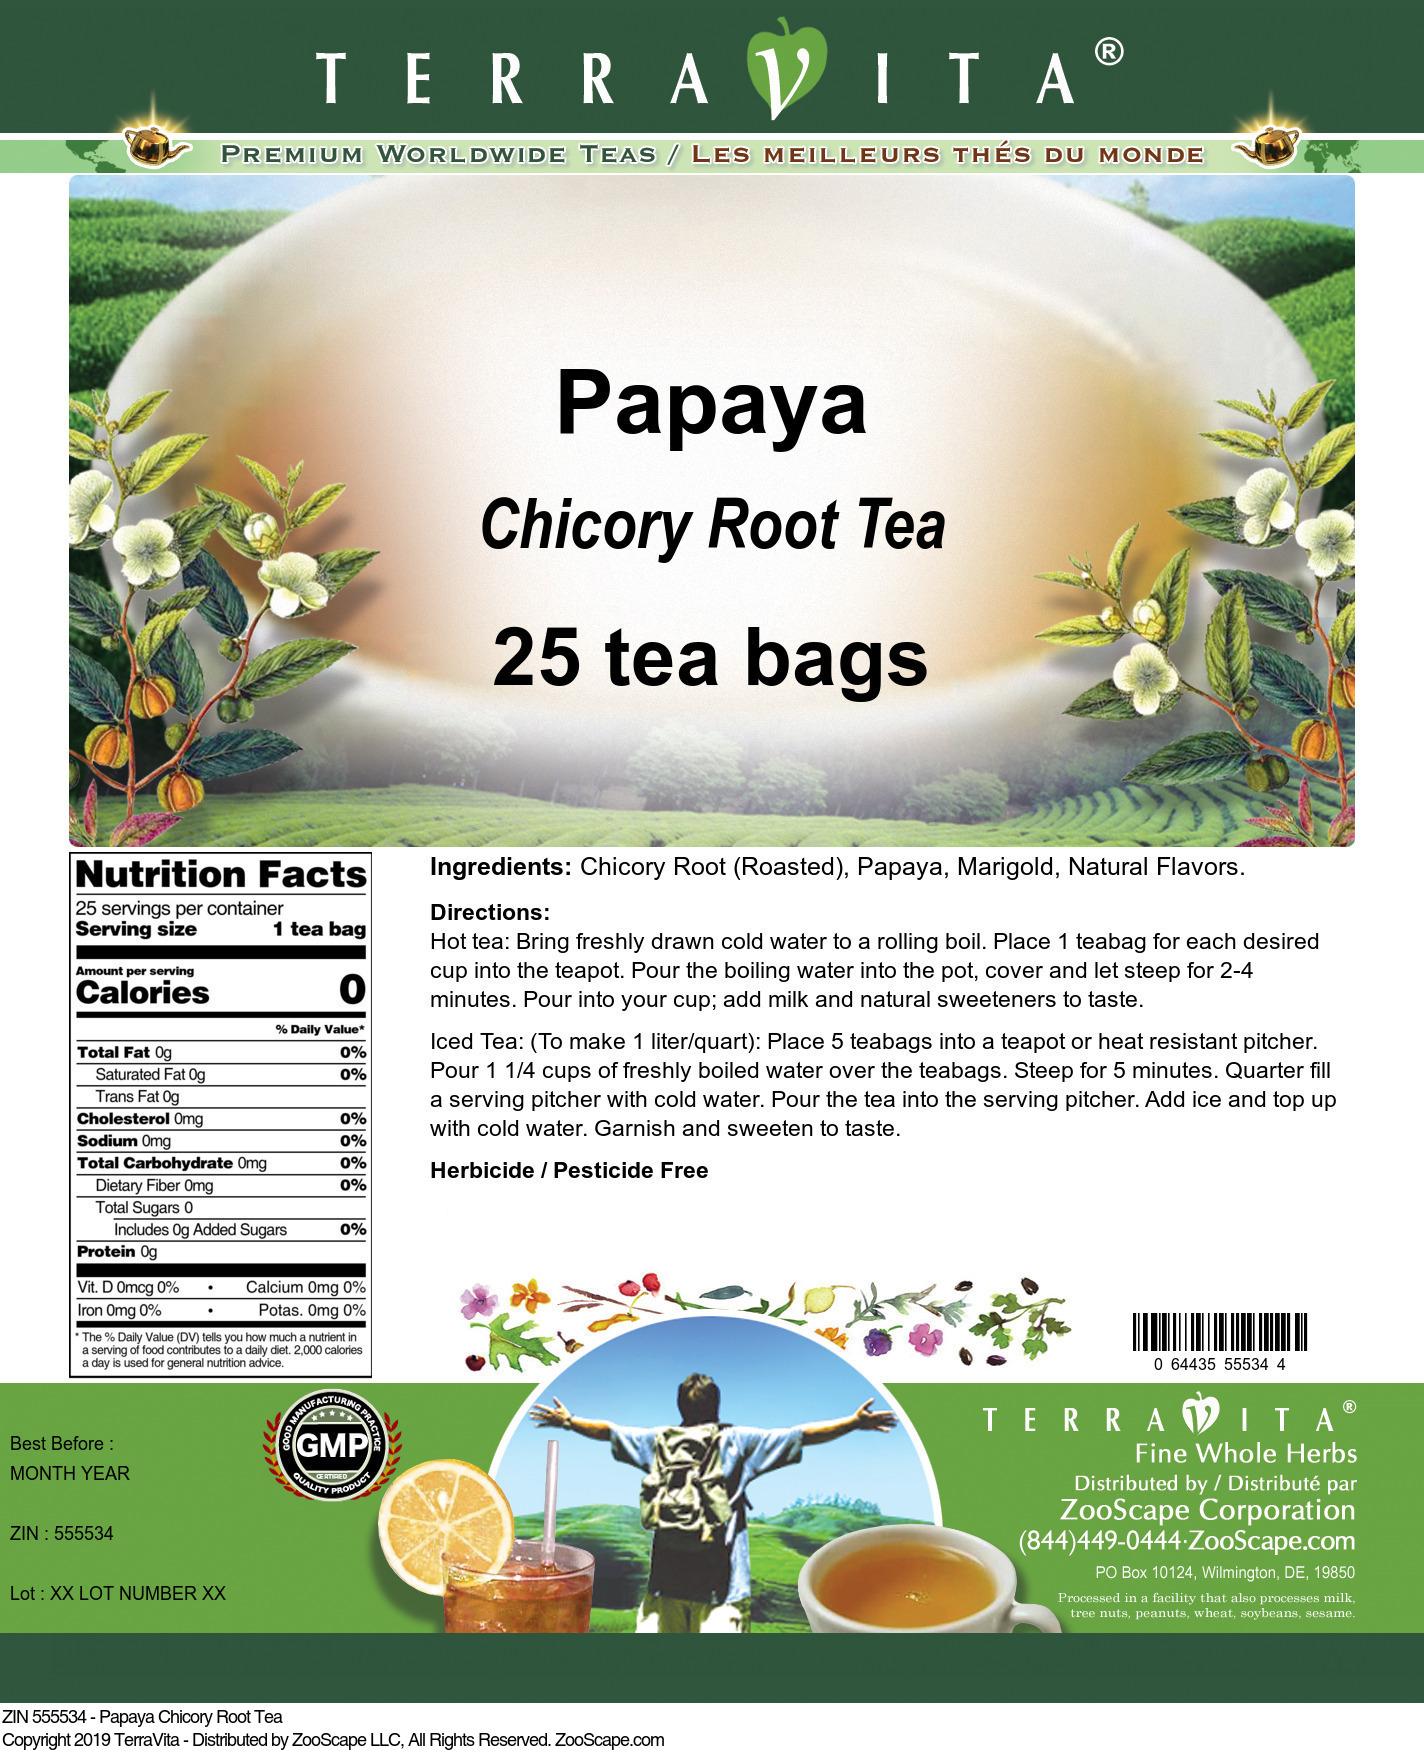 Papaya Chicory Root Tea